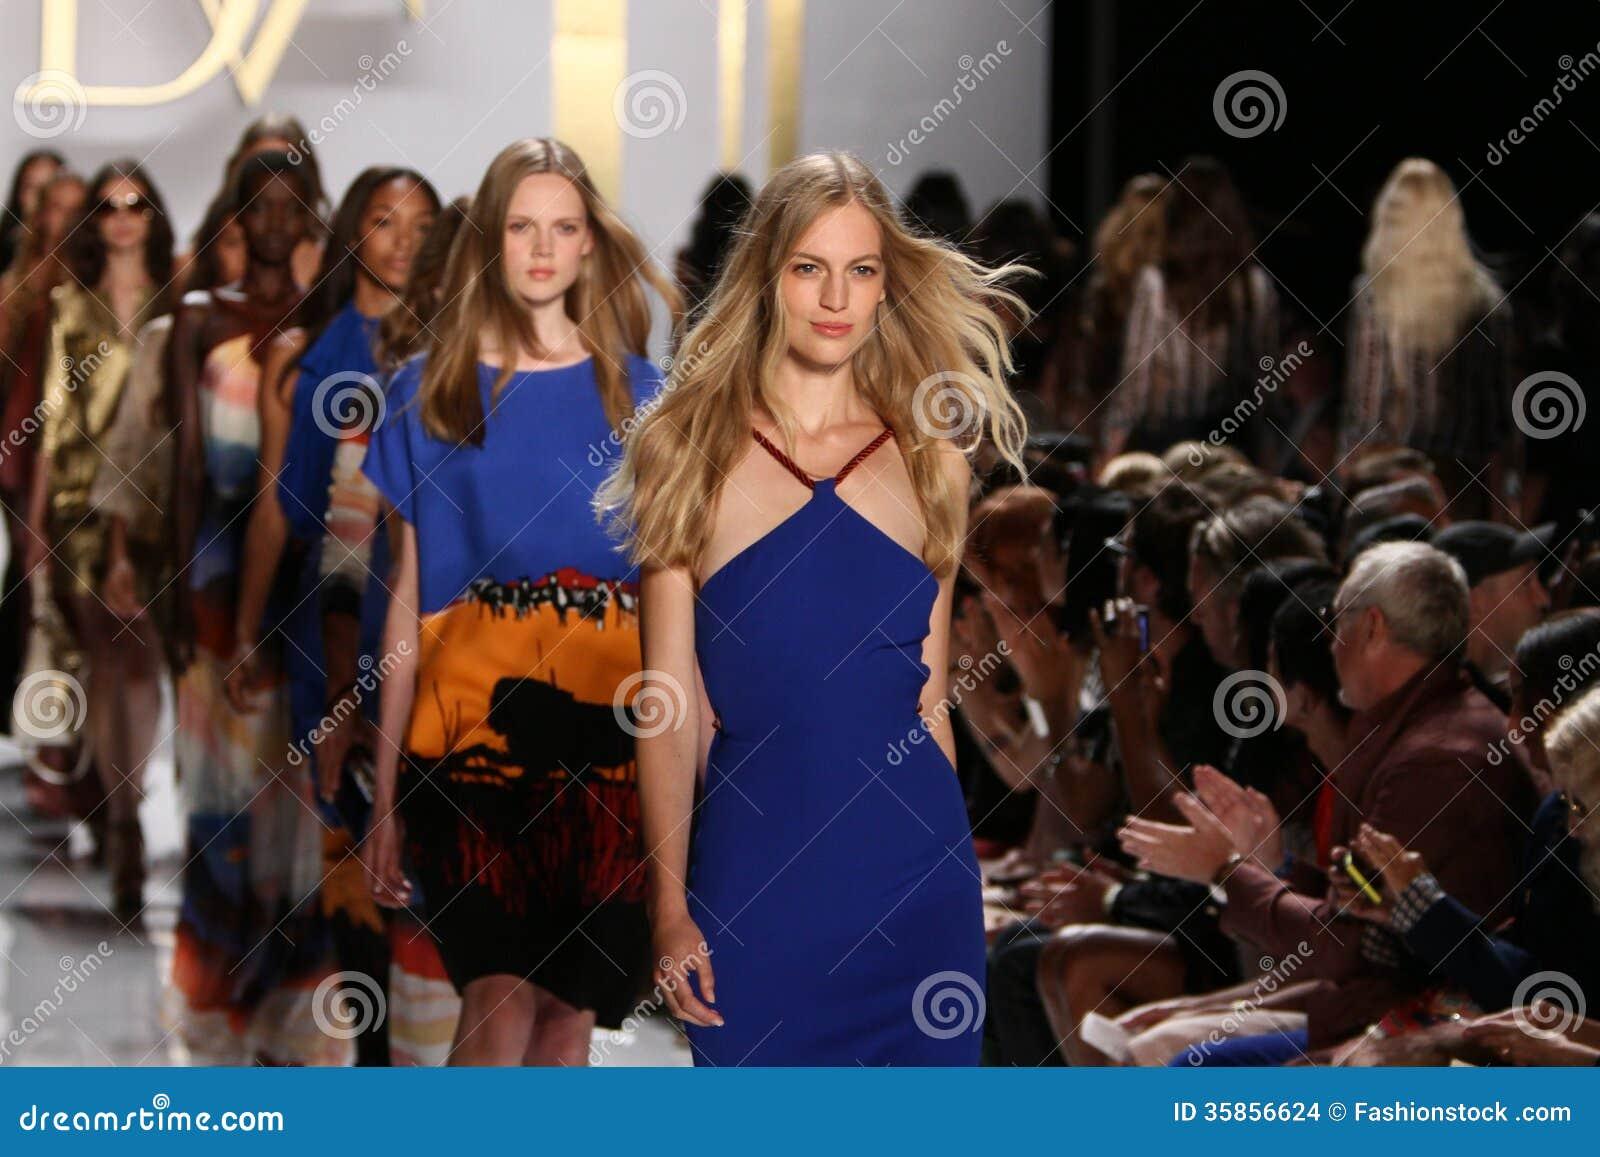 NEW YORK NY - SEPTEMBER 08: Modeller går landningsbanafinalen under den Diane Von Furstenberg modeshowen